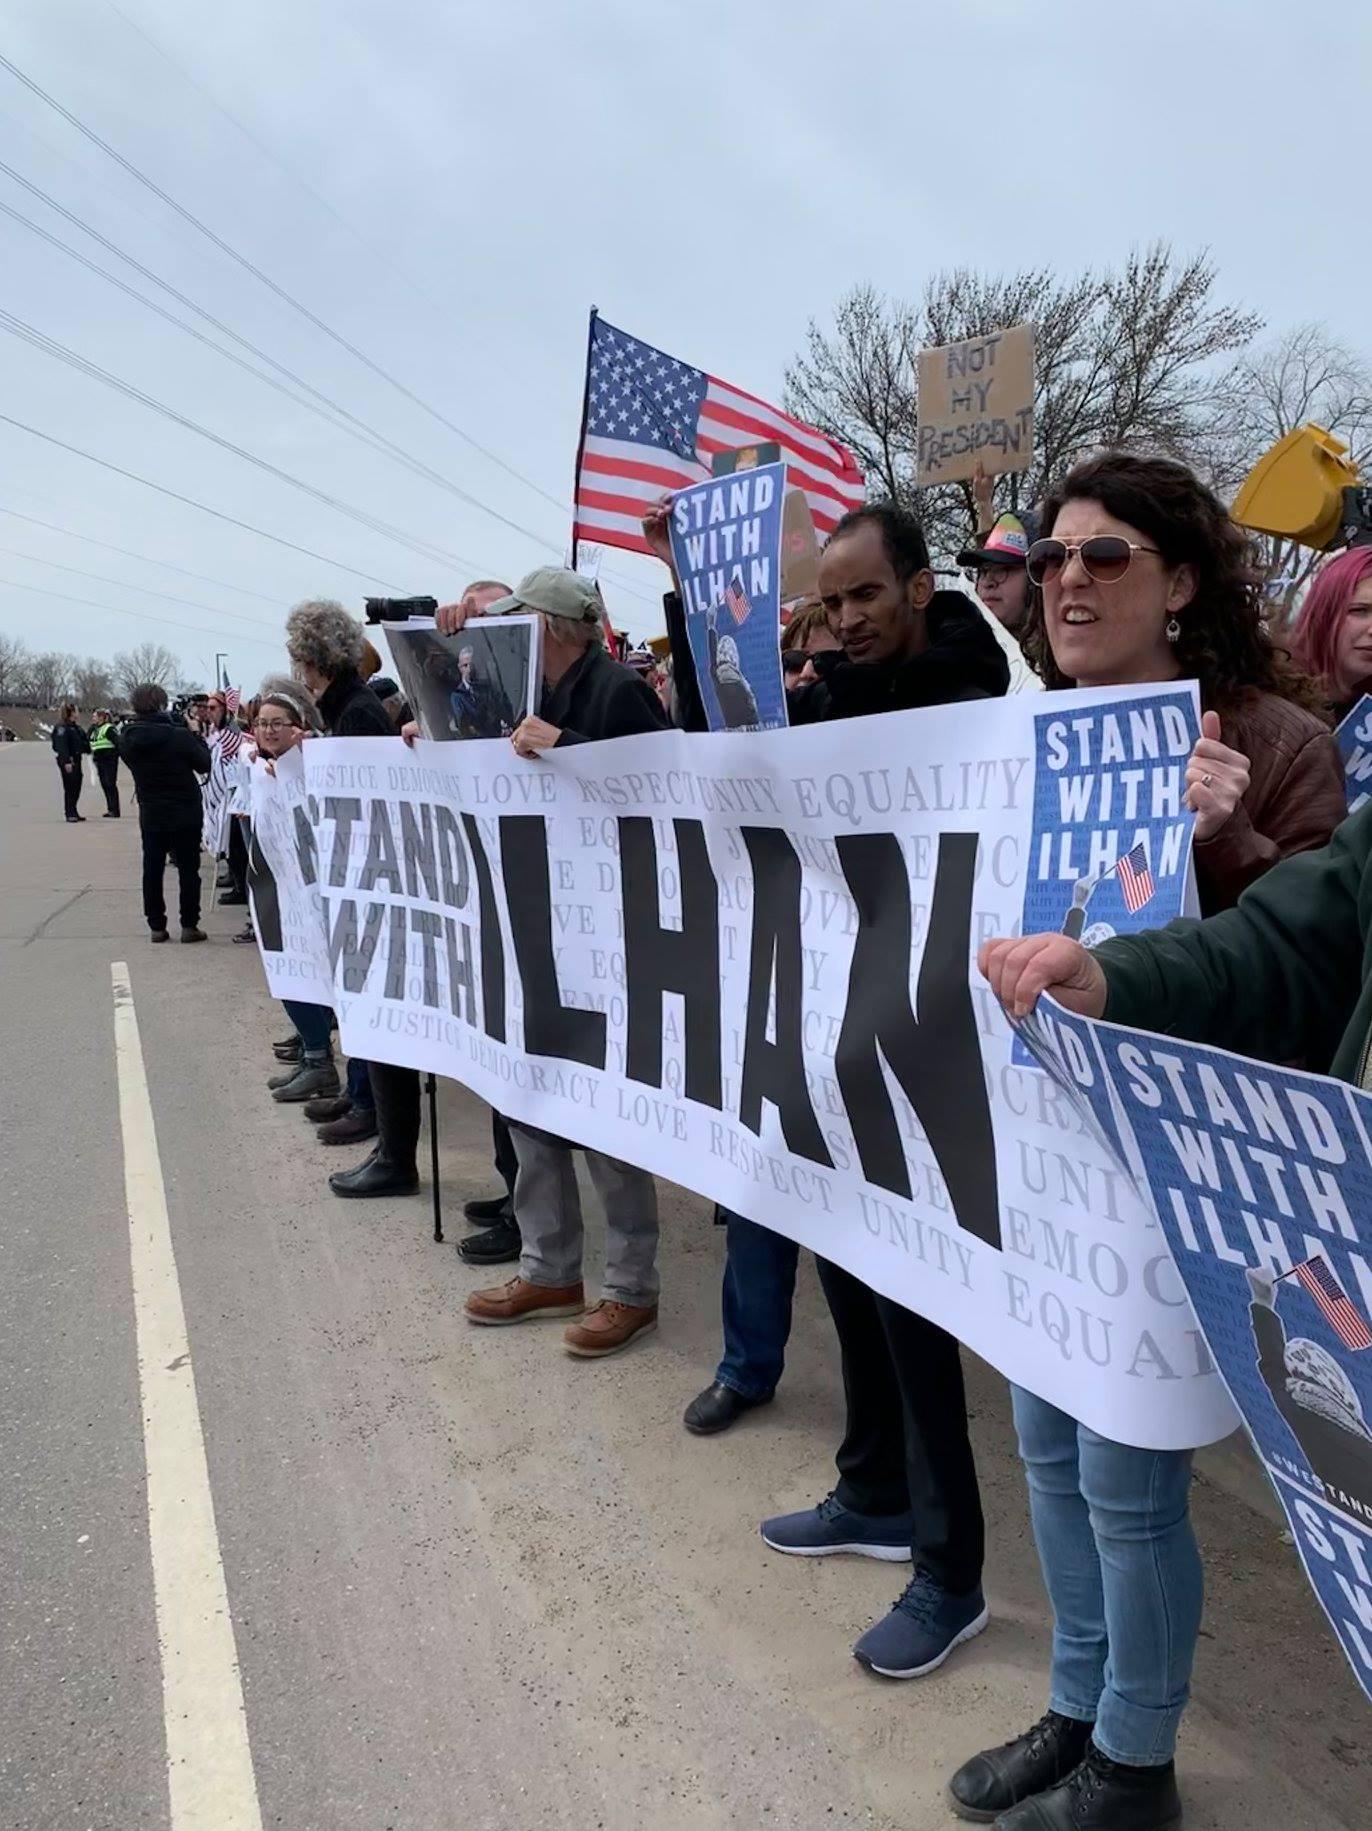 Anti-Trump rally in Burnsville 4/15/19